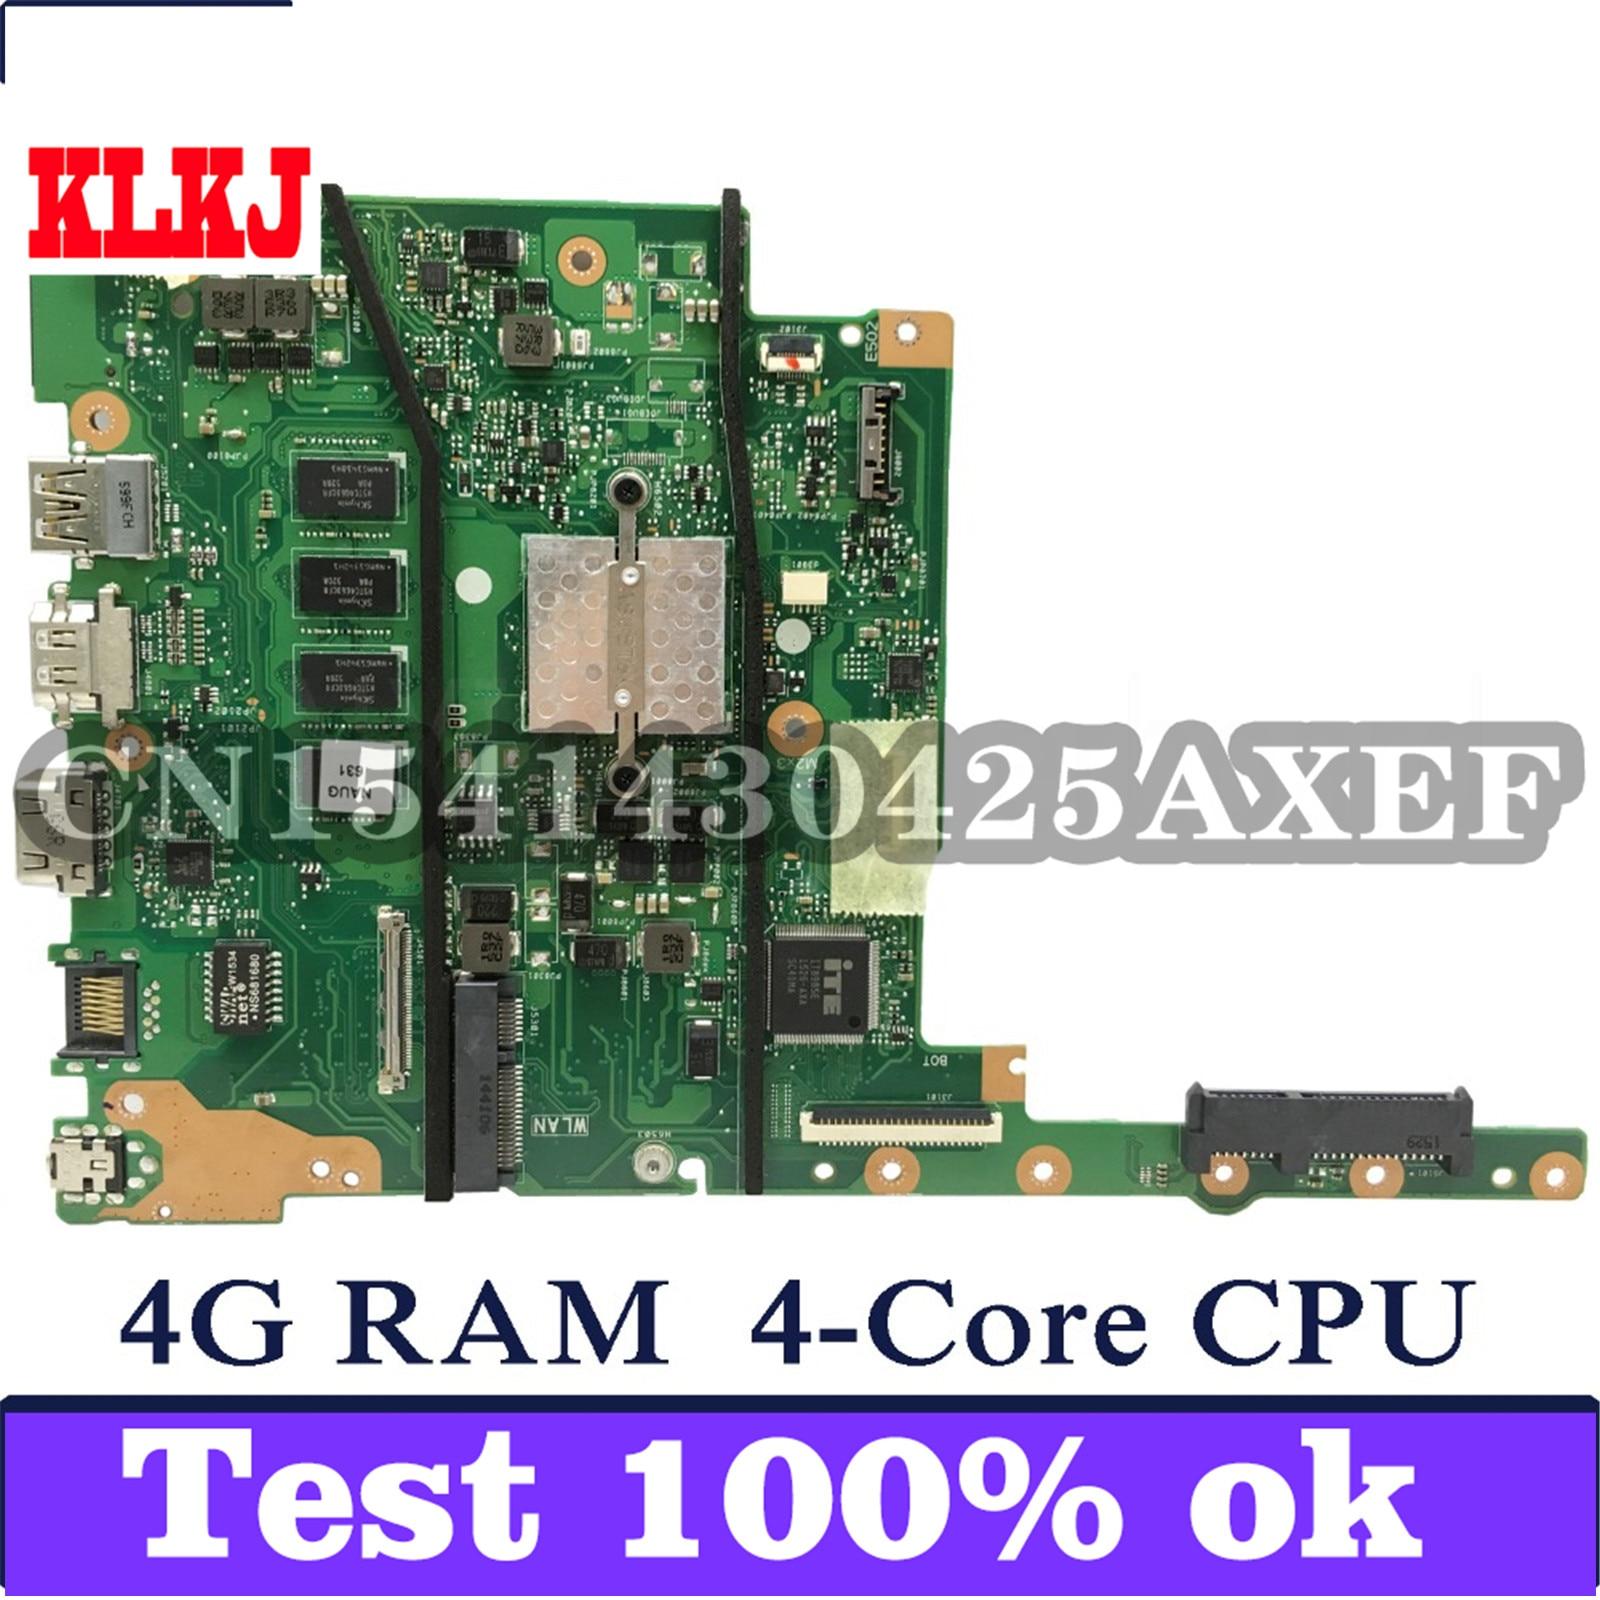 KLKJ E402MA E502MA اللوحة الأم للكمبيوتر المحمول ASUS E402MA E502MA E402M E502M E402 E502 اختبار اللوحة الرئيسية الأصلية 4G RAM N2940 4-Core